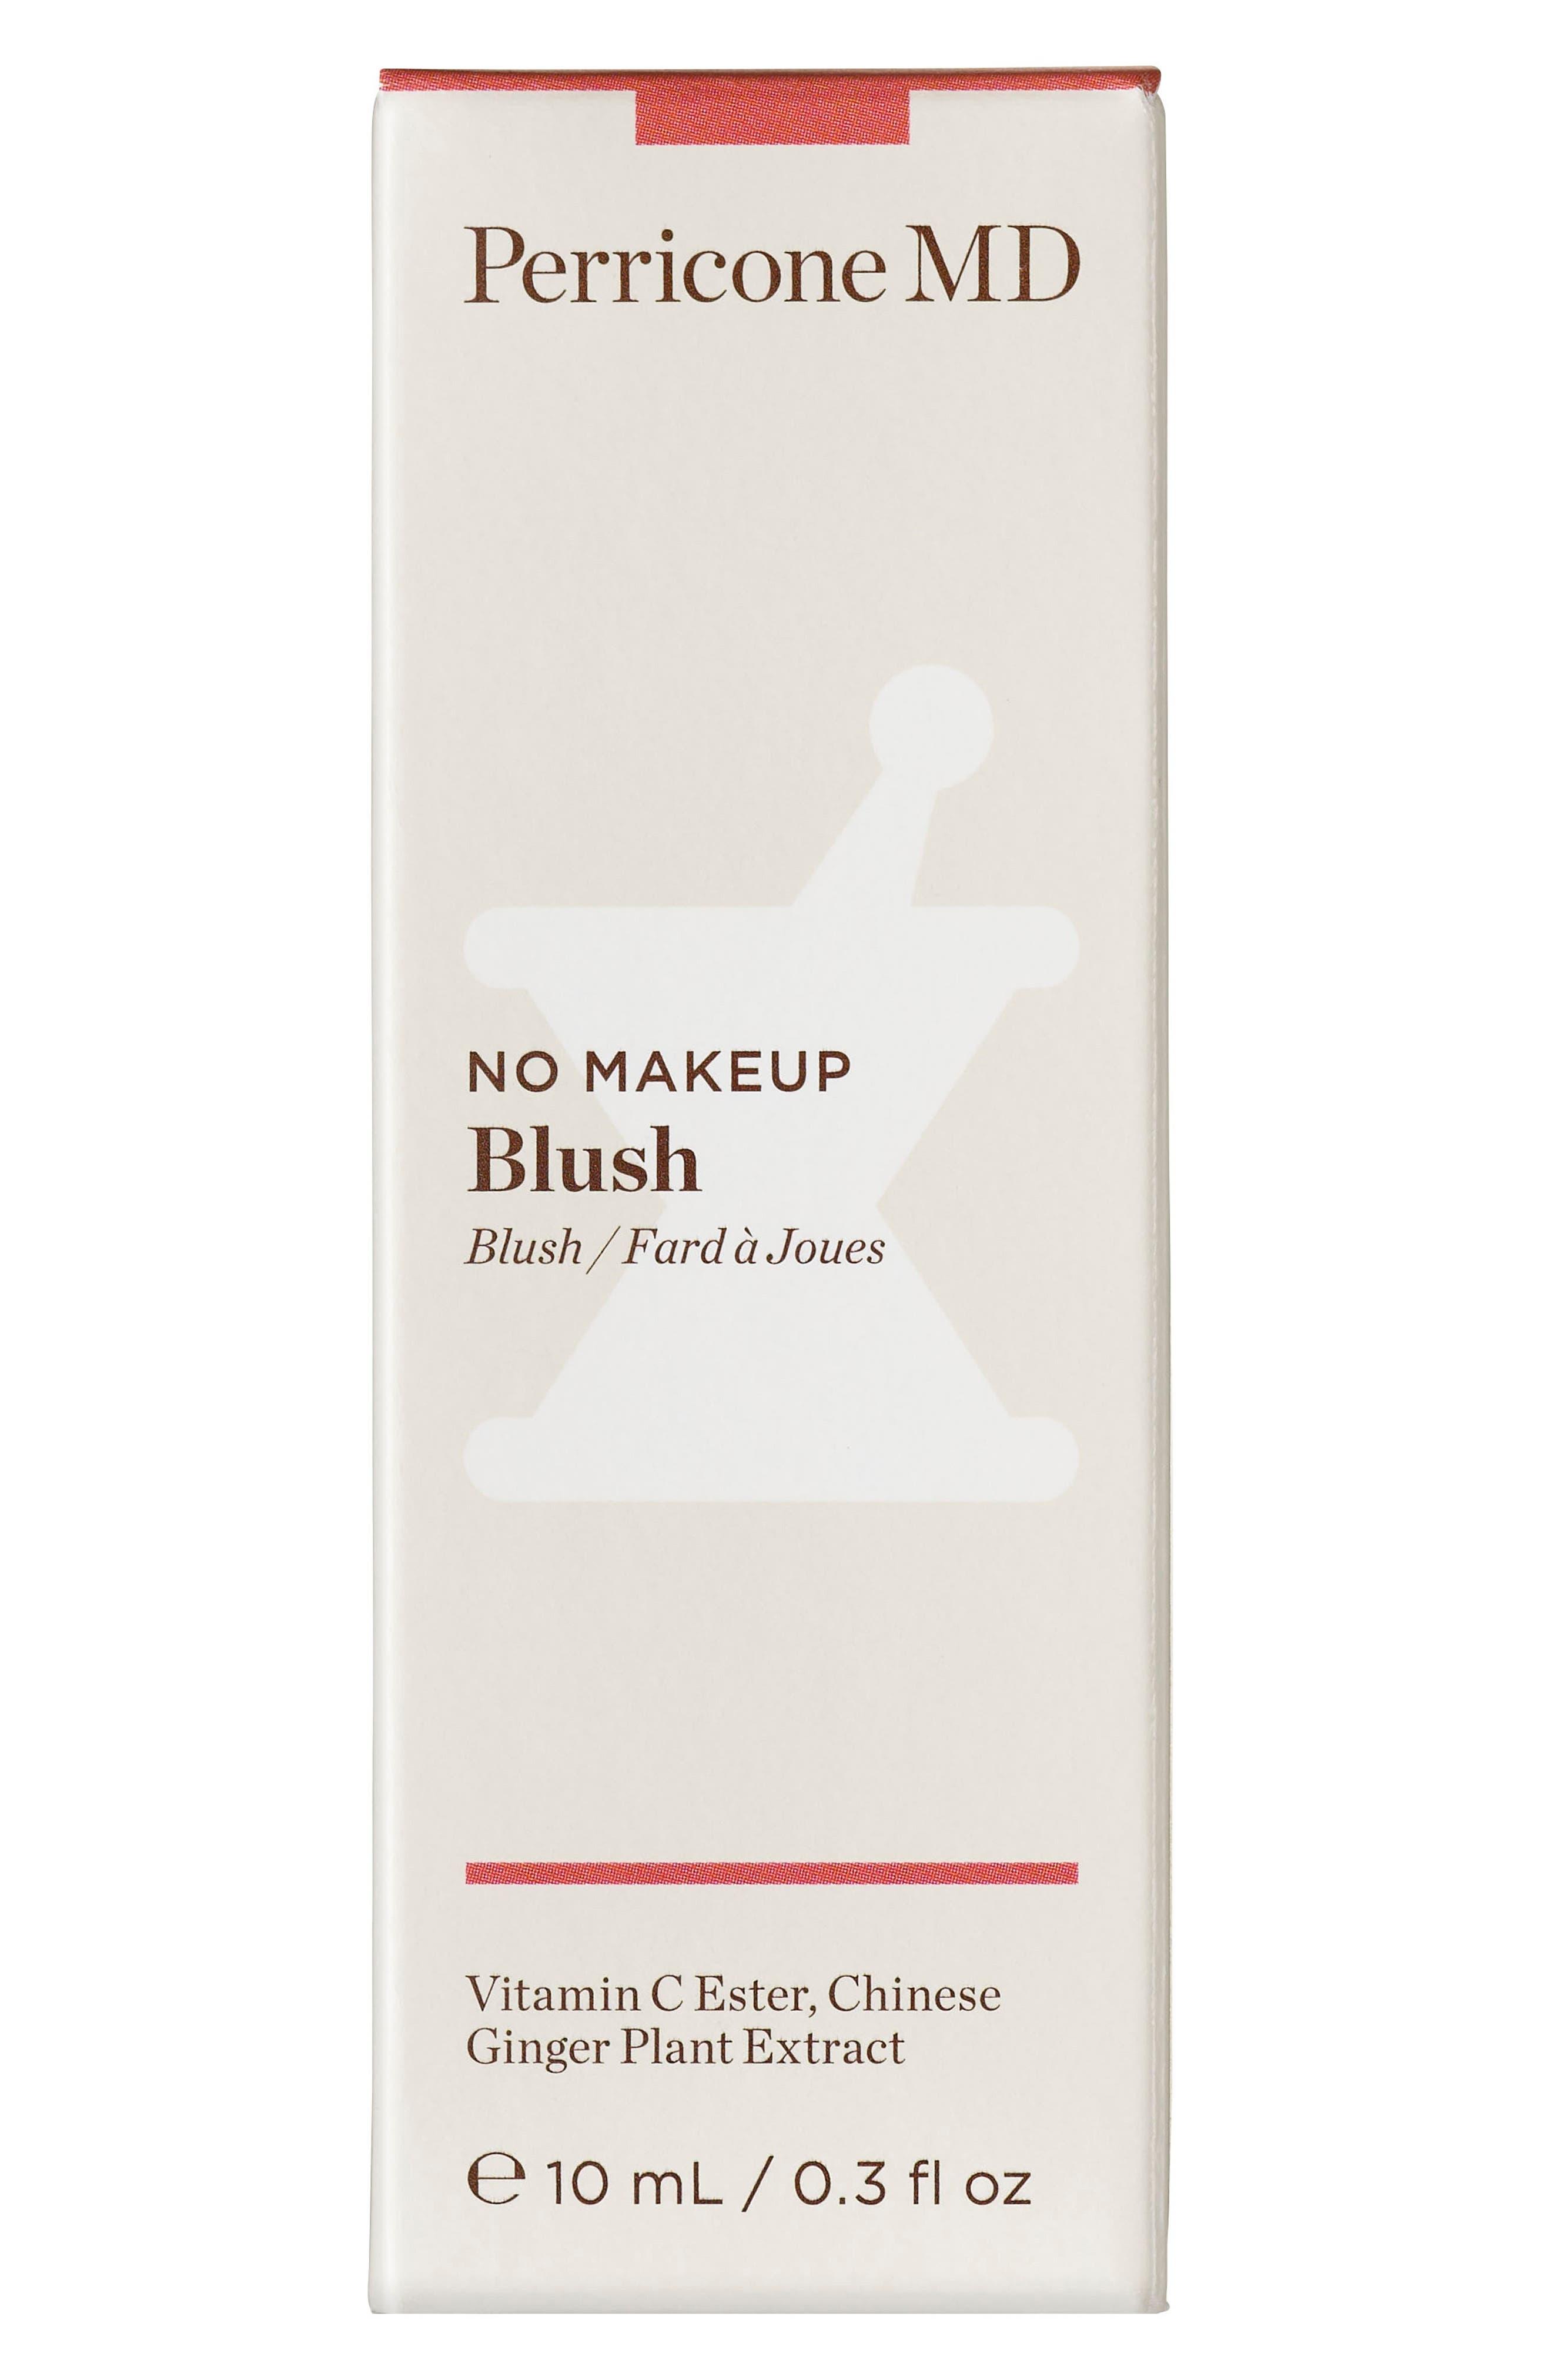 PERRICONE MD, No Makeup Blush, Alternate thumbnail 3, color, 000